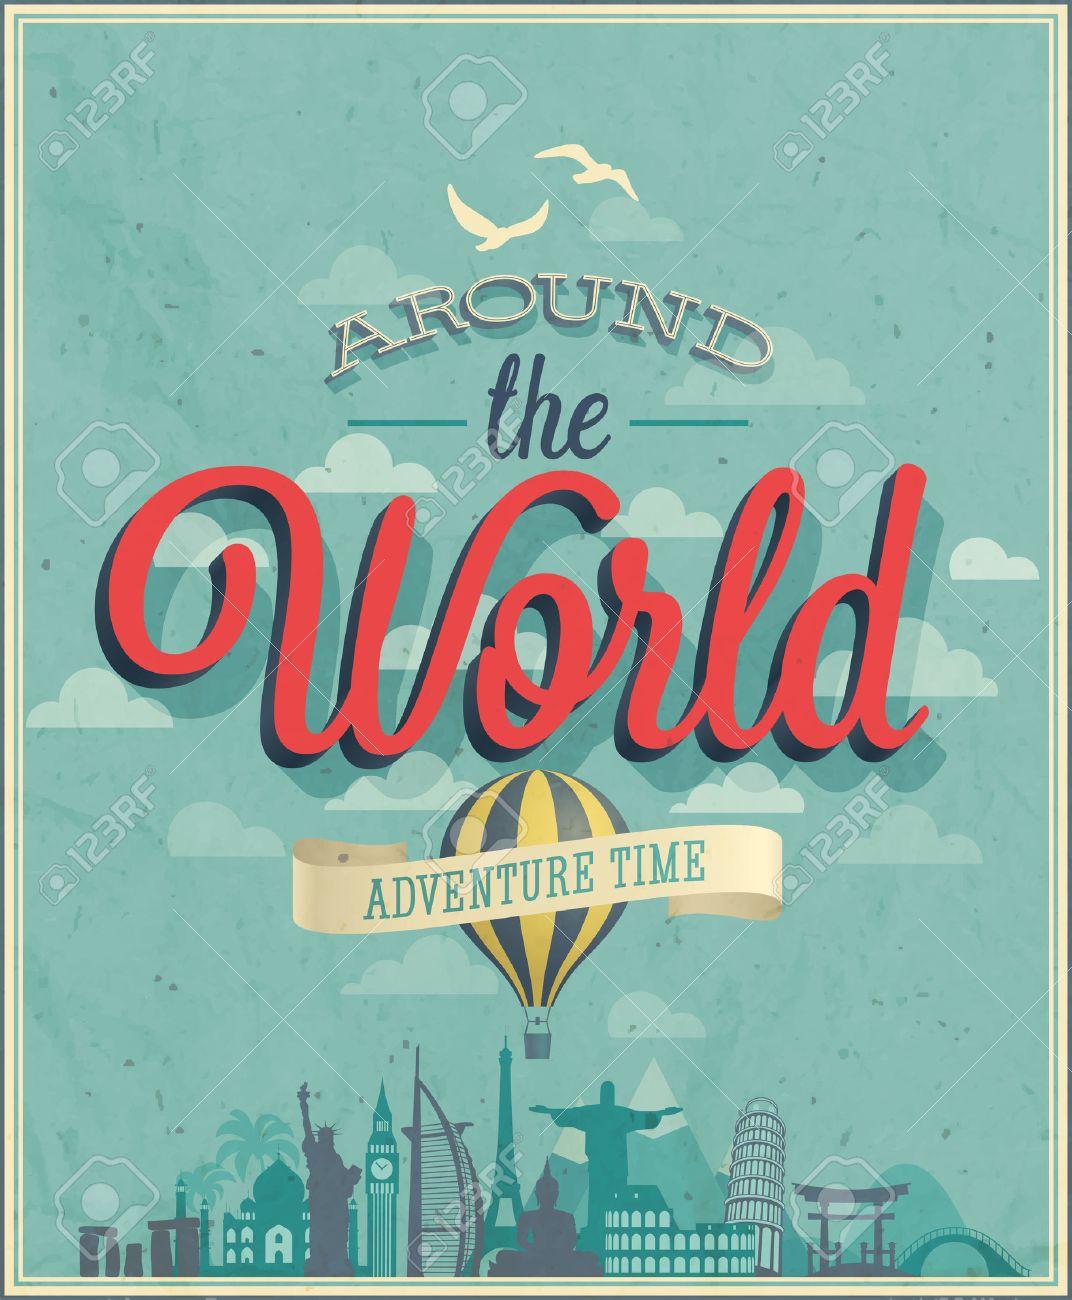 Around the world poster illustration. - 29044423